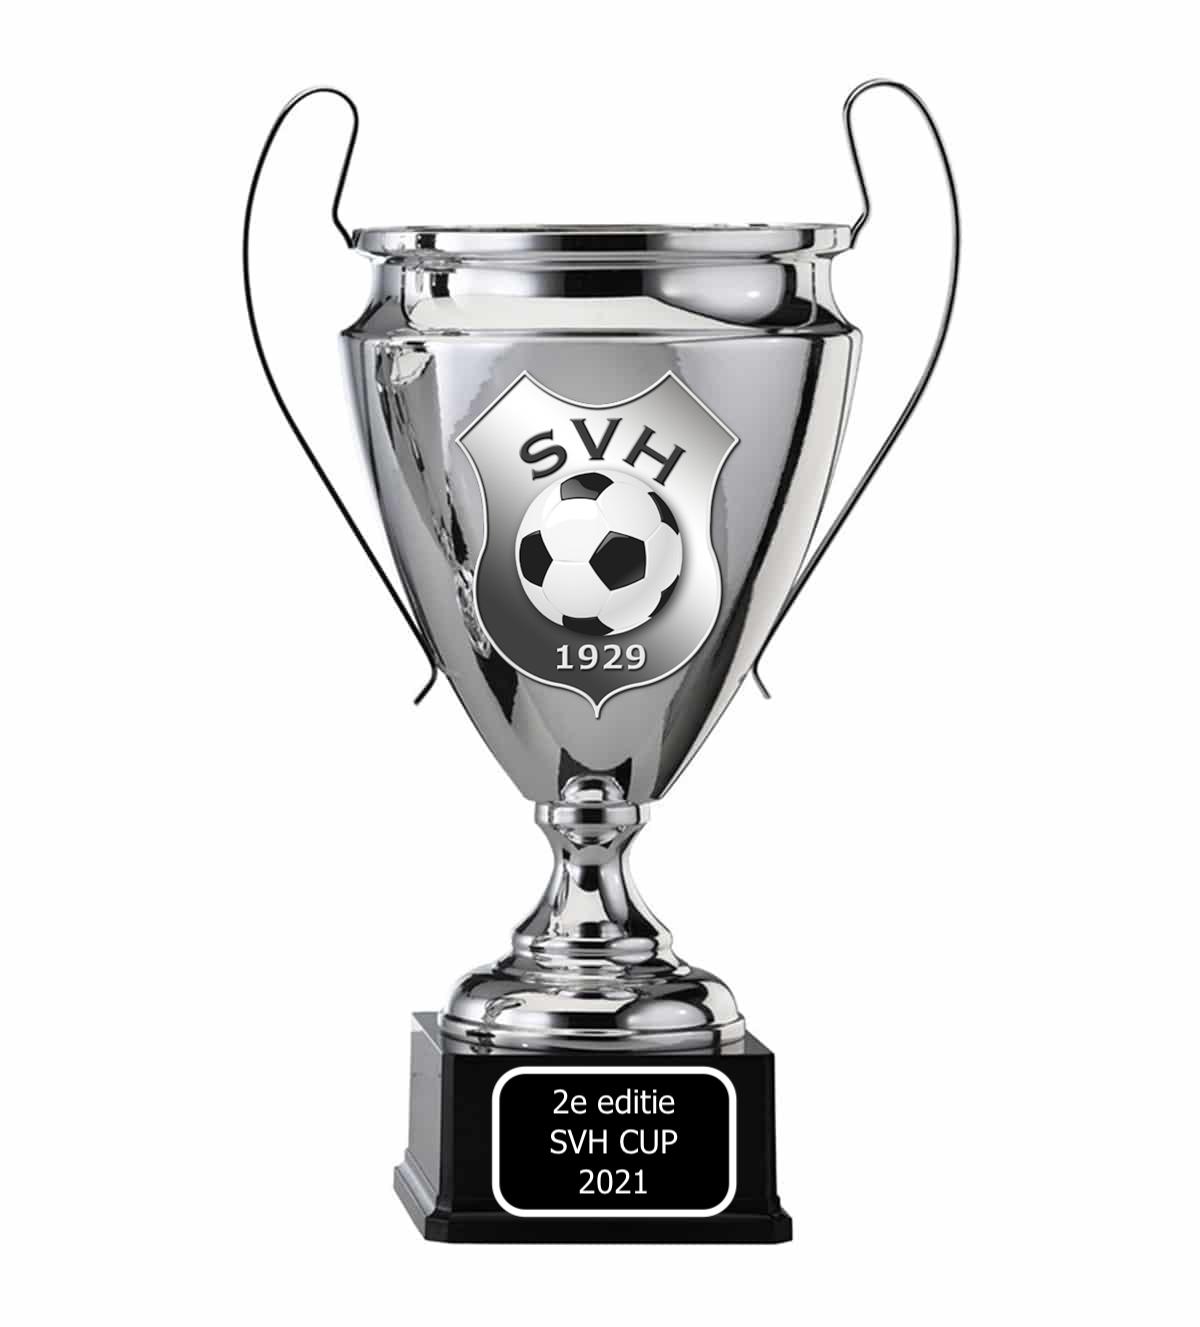 2e editie SVH Cup